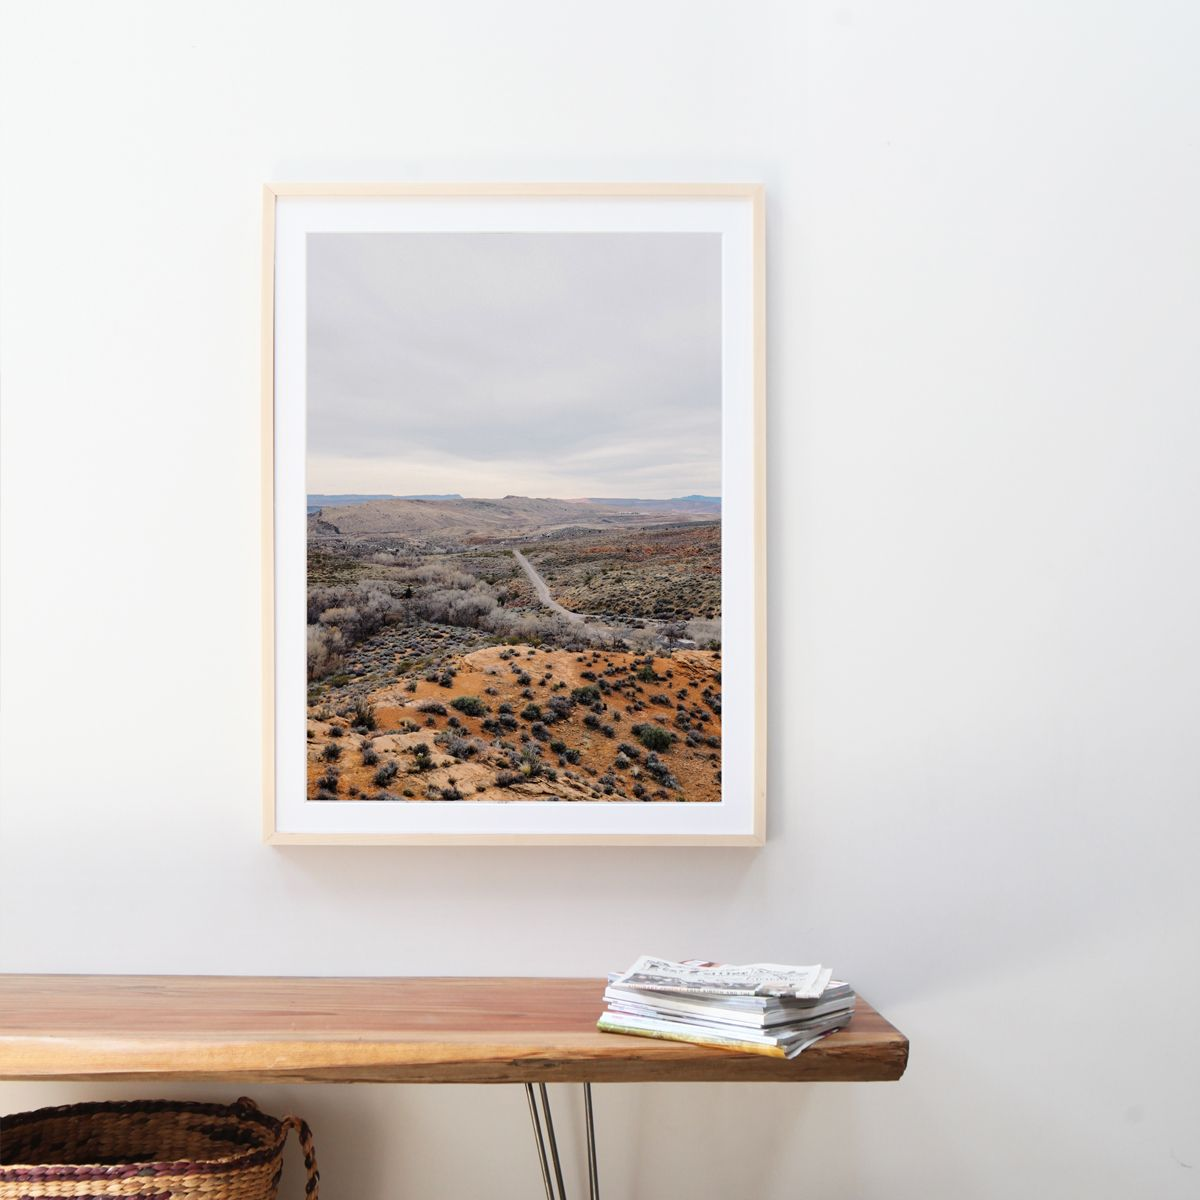 gallery-frame-main02-print-above-bench_2x.jpg